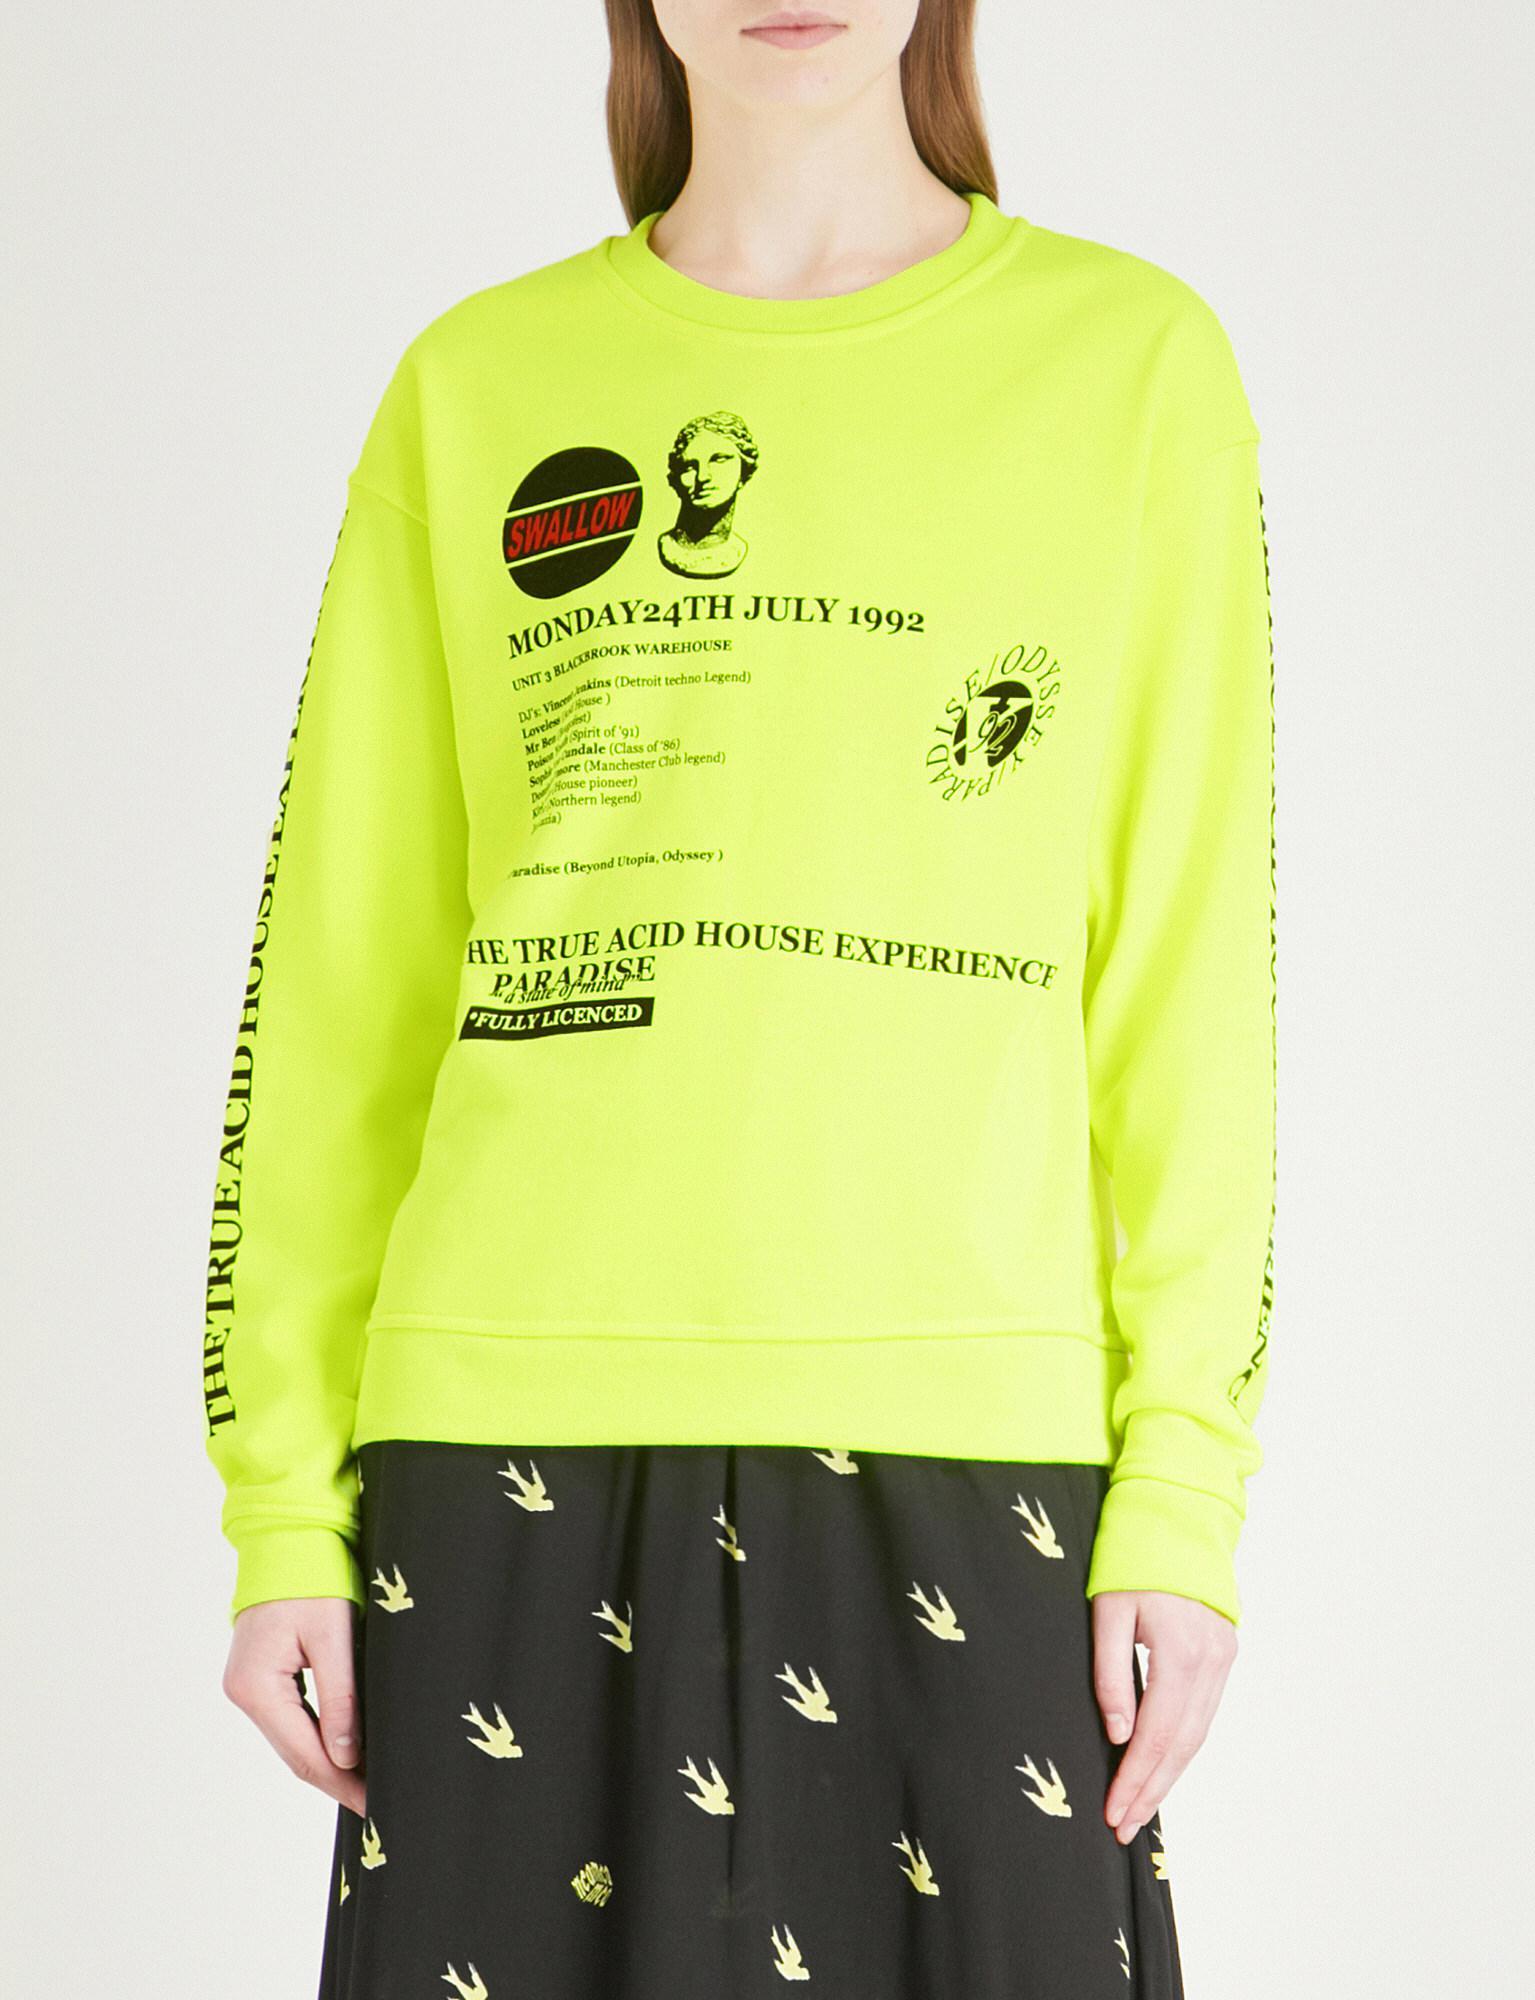 Lyst - McQ Acid House Jersey Sweatshirt in Yellow 5da69ca7d1b